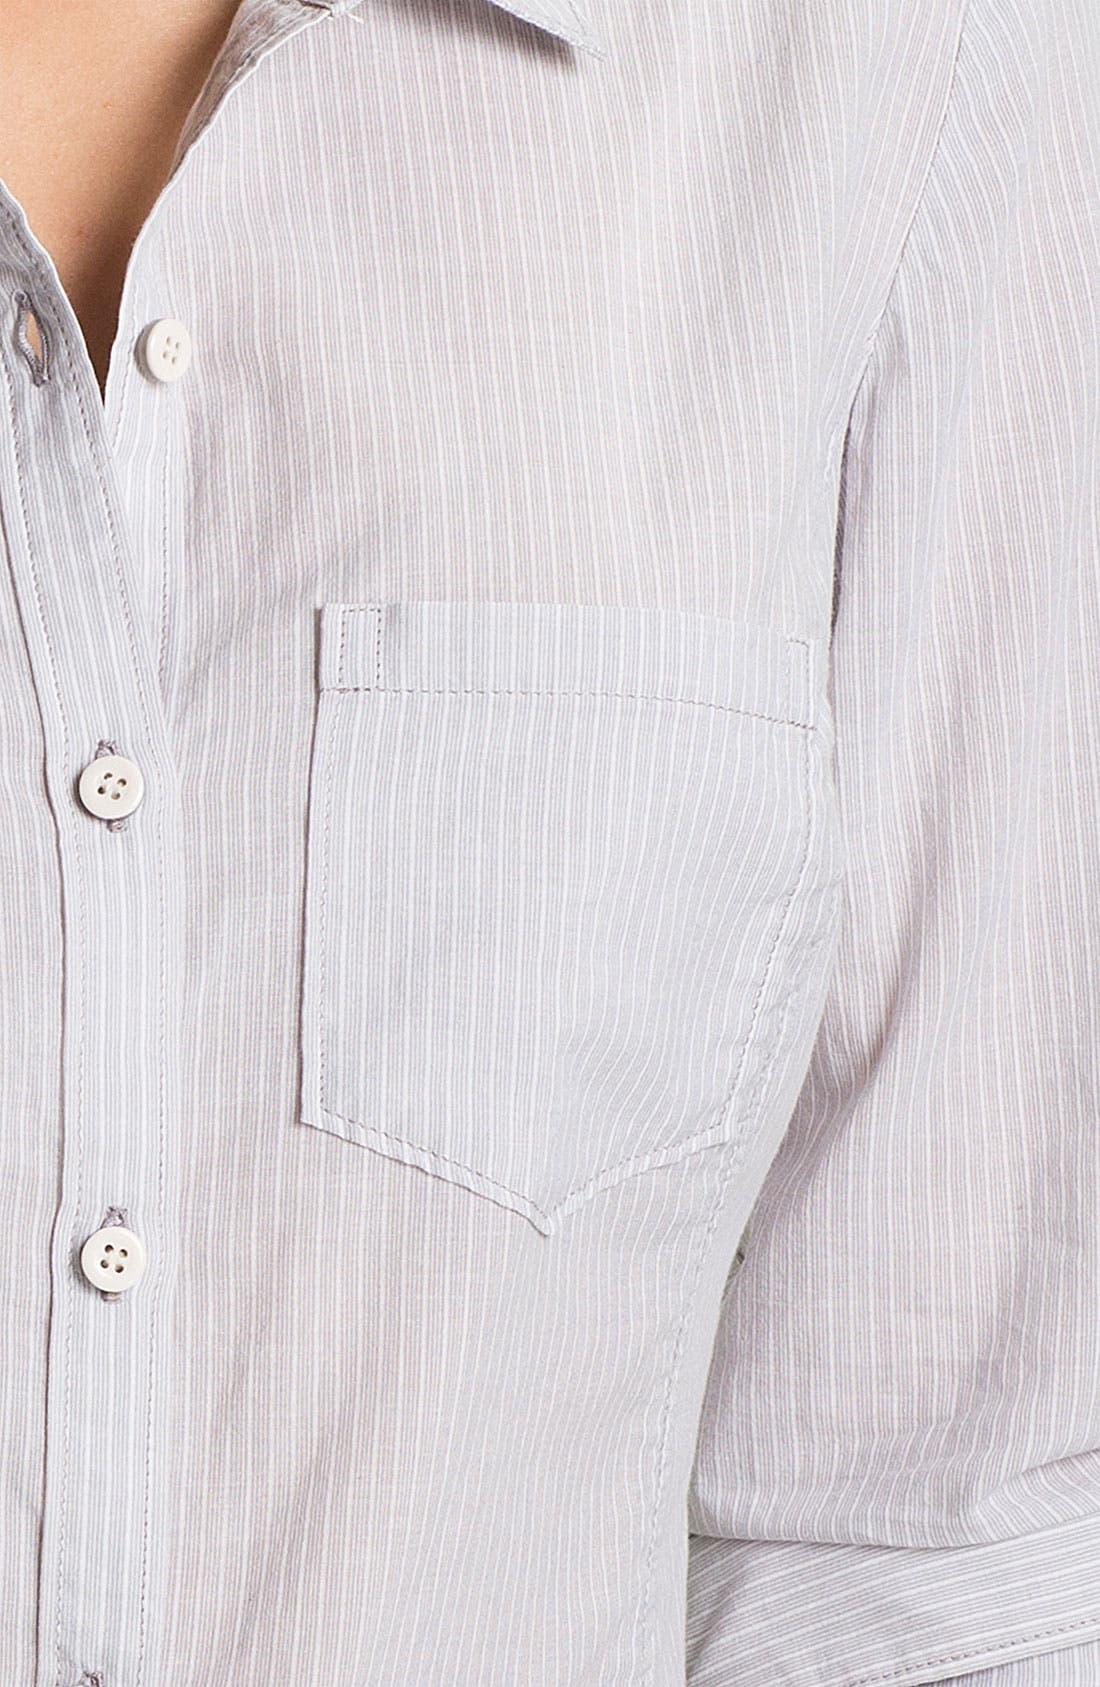 Long Sleeve Shirt,                             Alternate thumbnail 80, color,